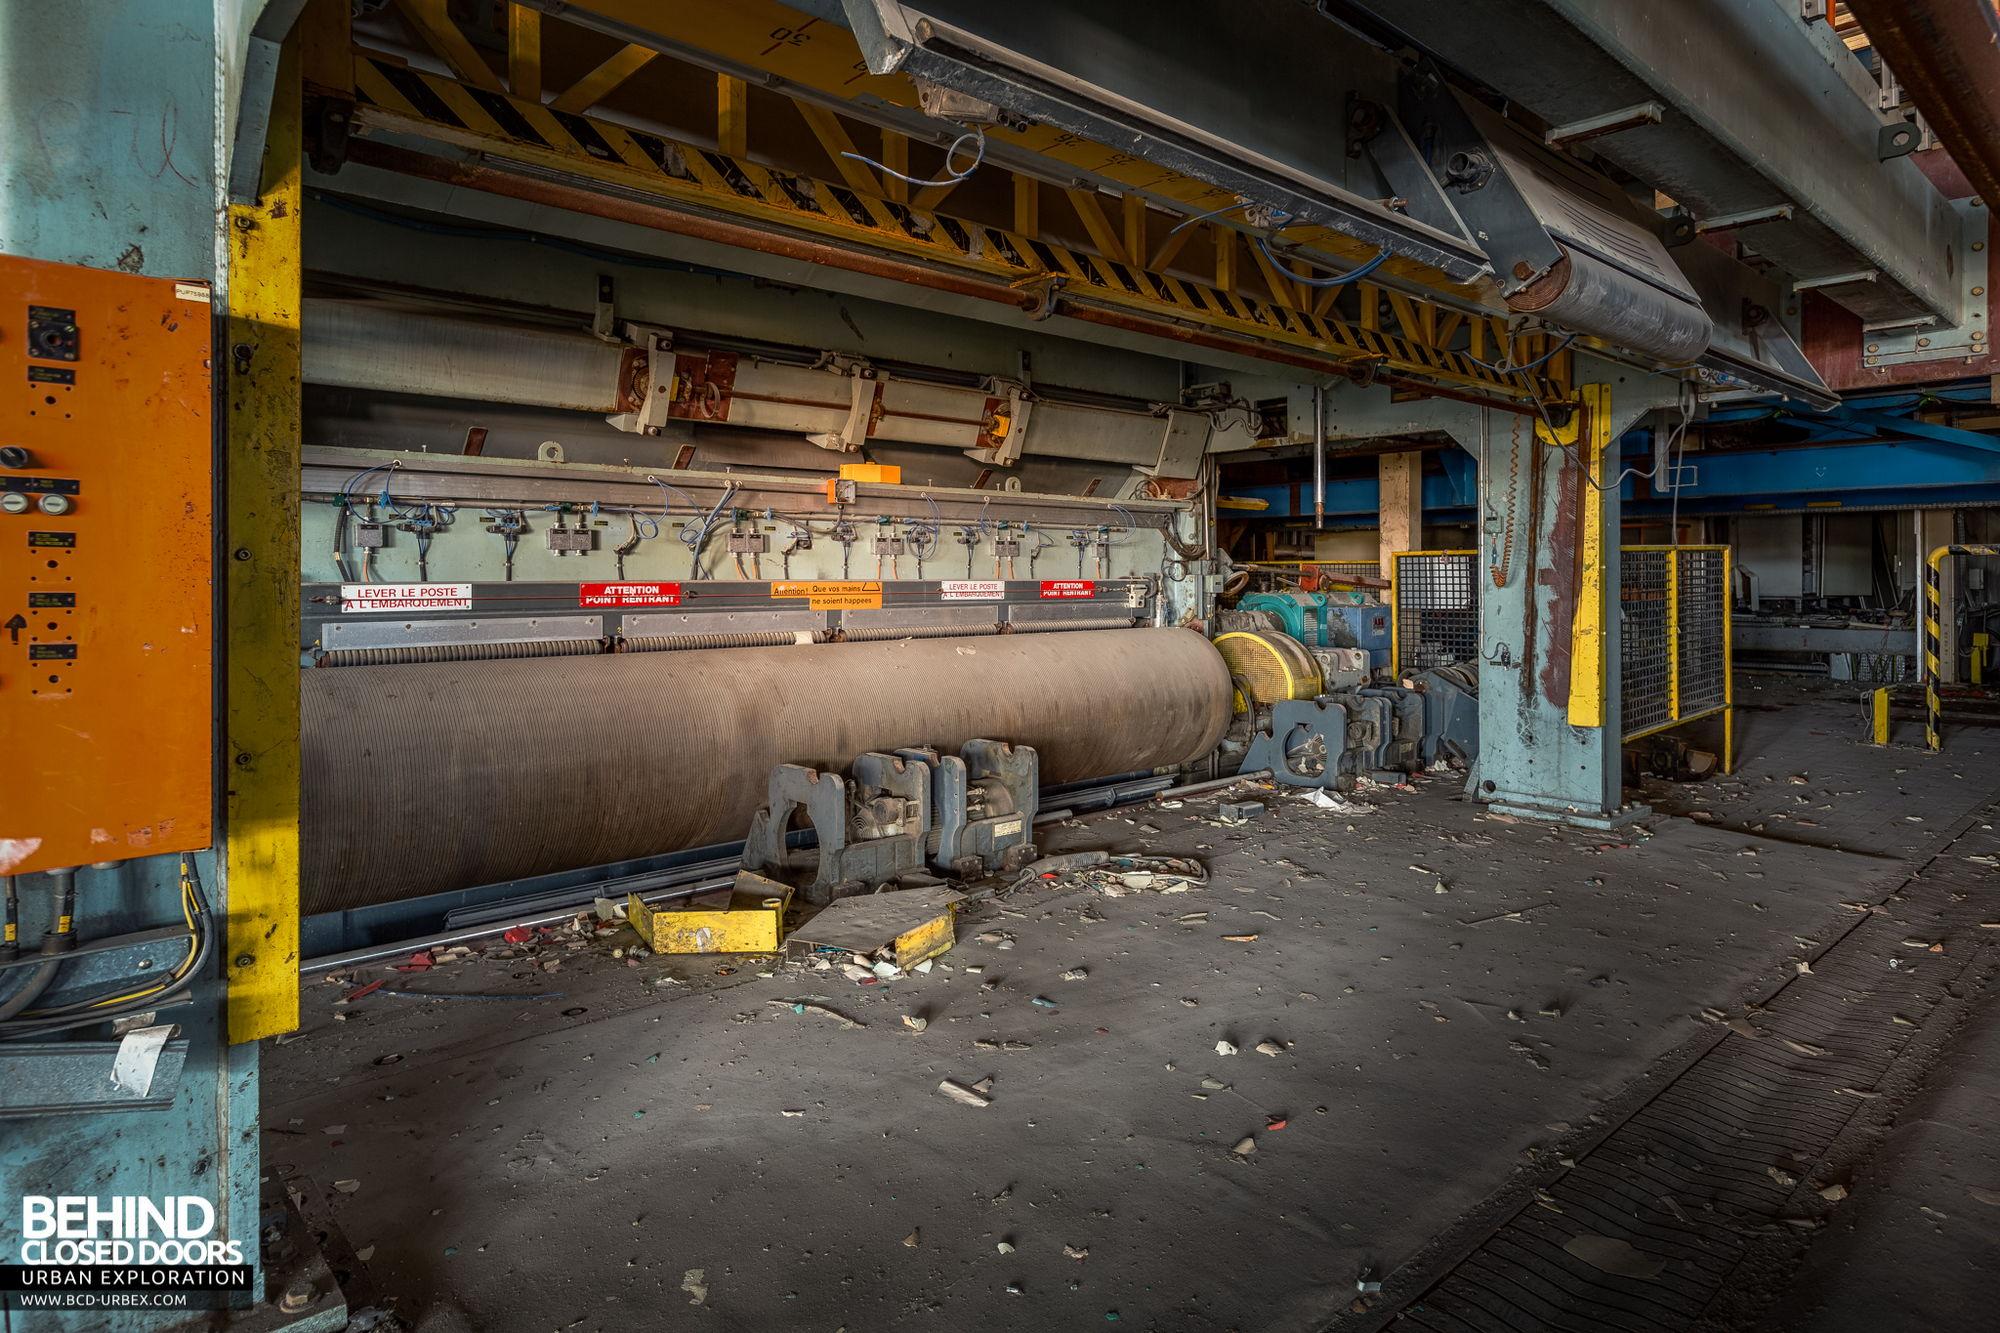 Stora Enso, Corbehem - Old paper machine equipment